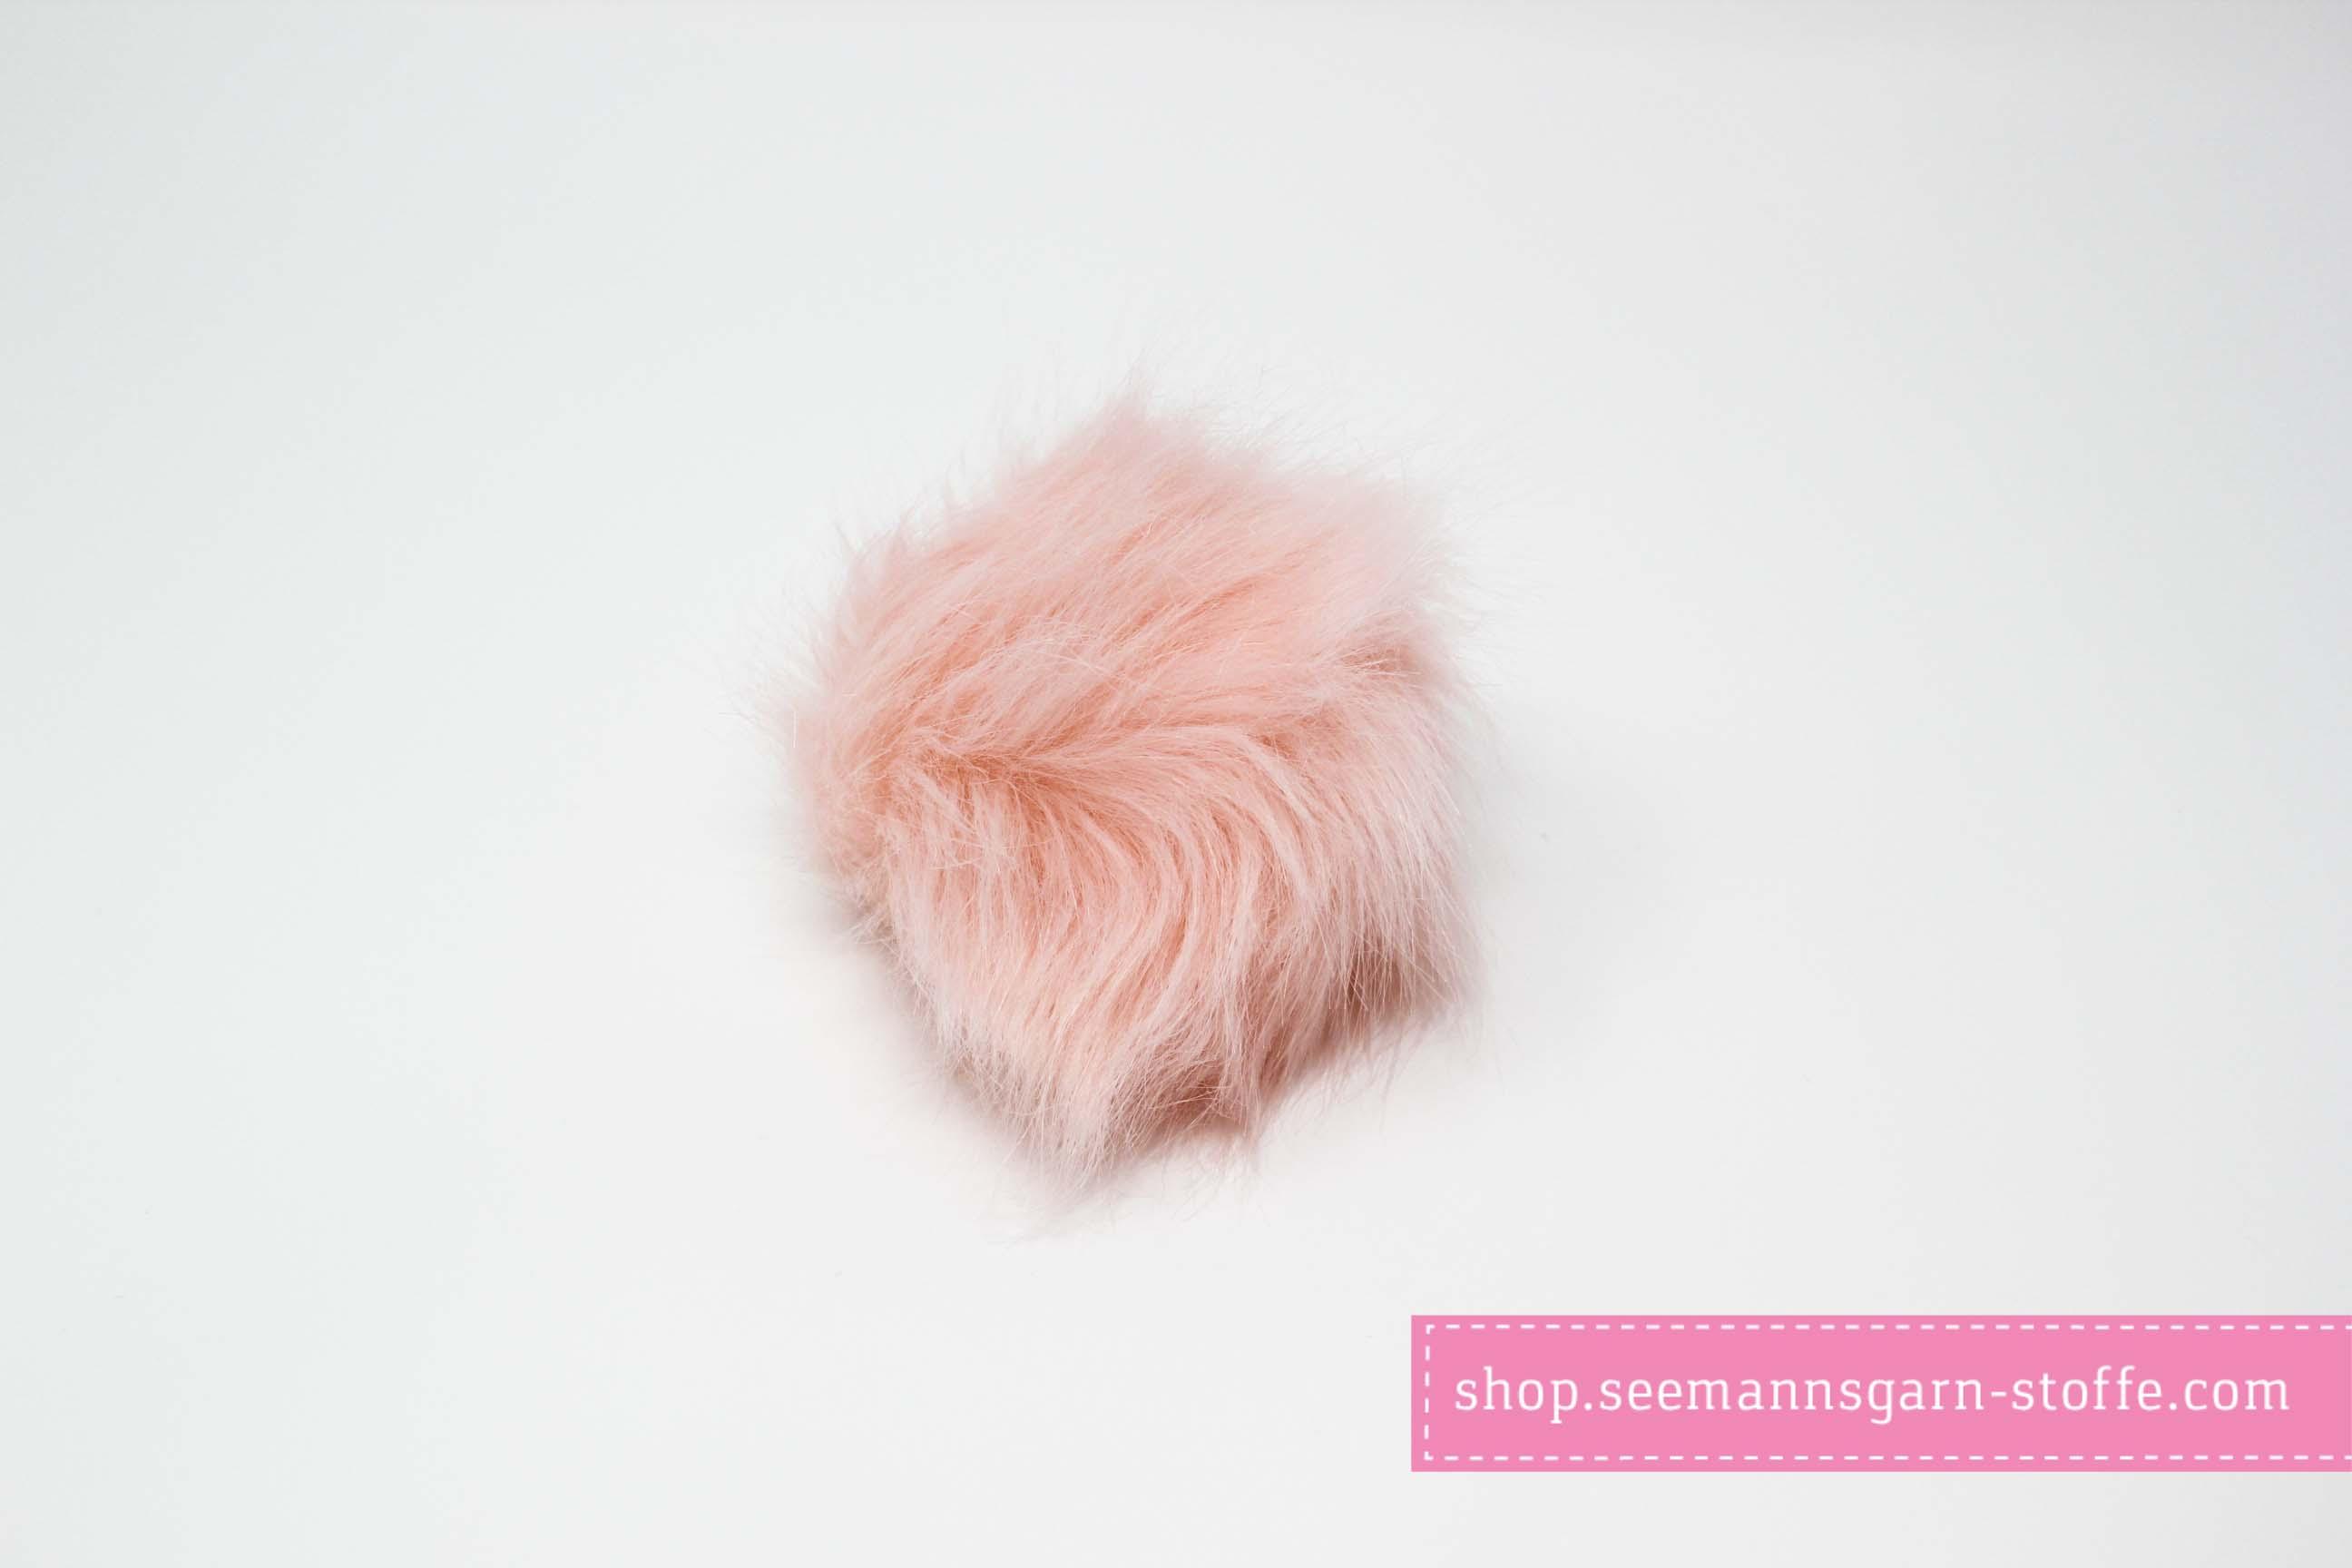 Pompom - rosa 12 mm mit Druckknopf